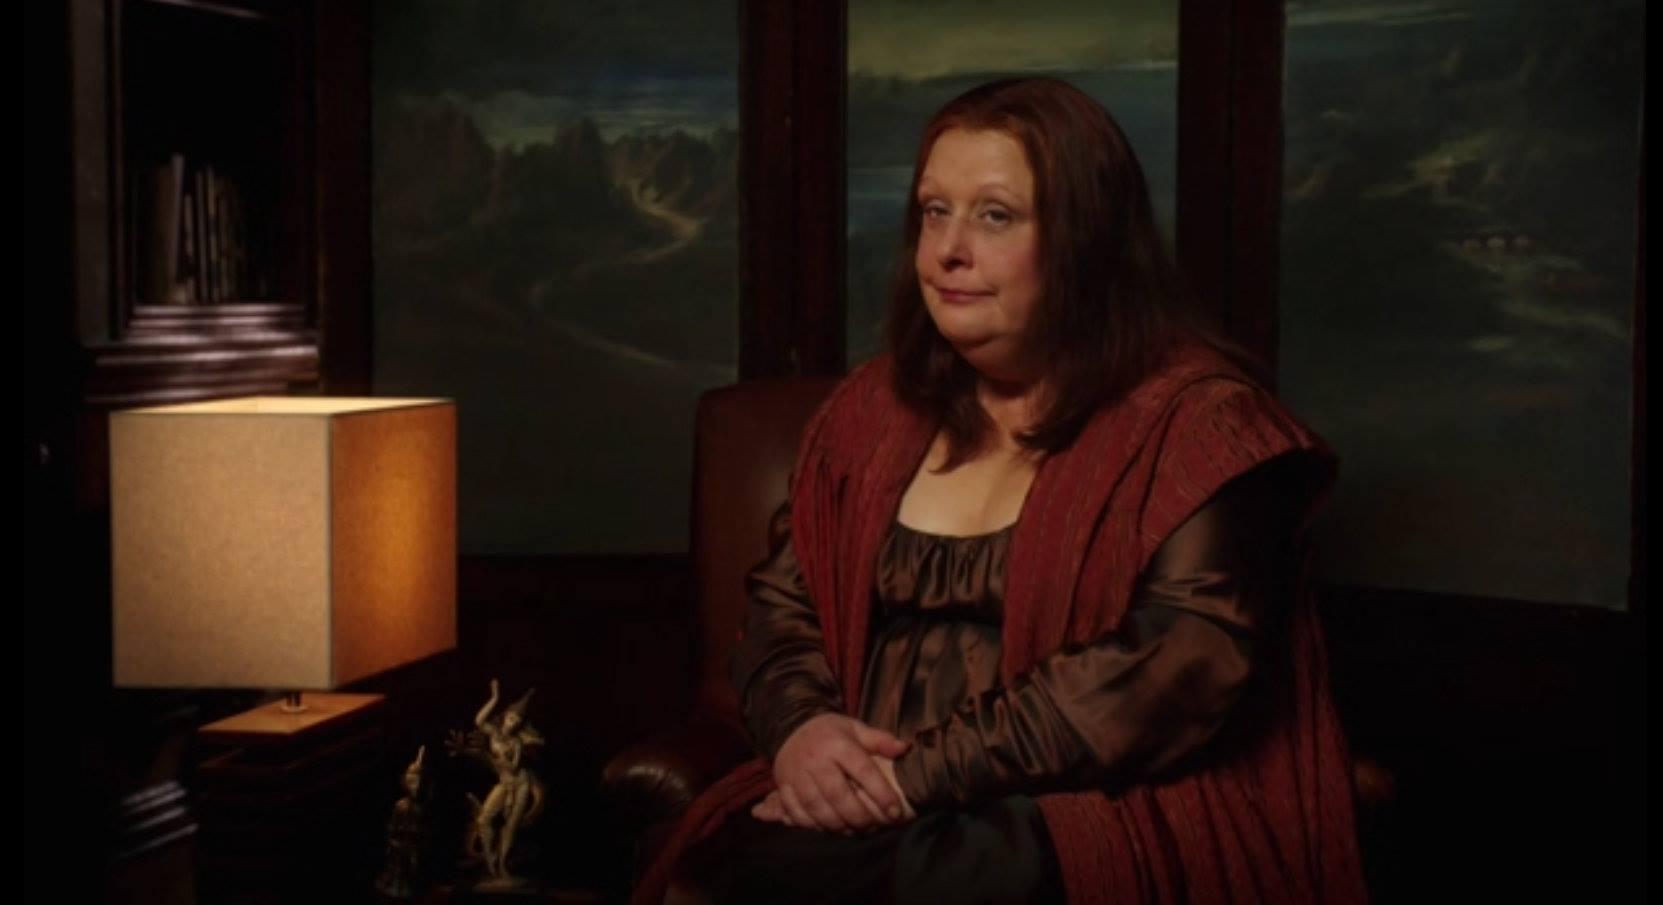 Clara Horton,Sheena Easton Sex video Robin Ignico,Melania Trump